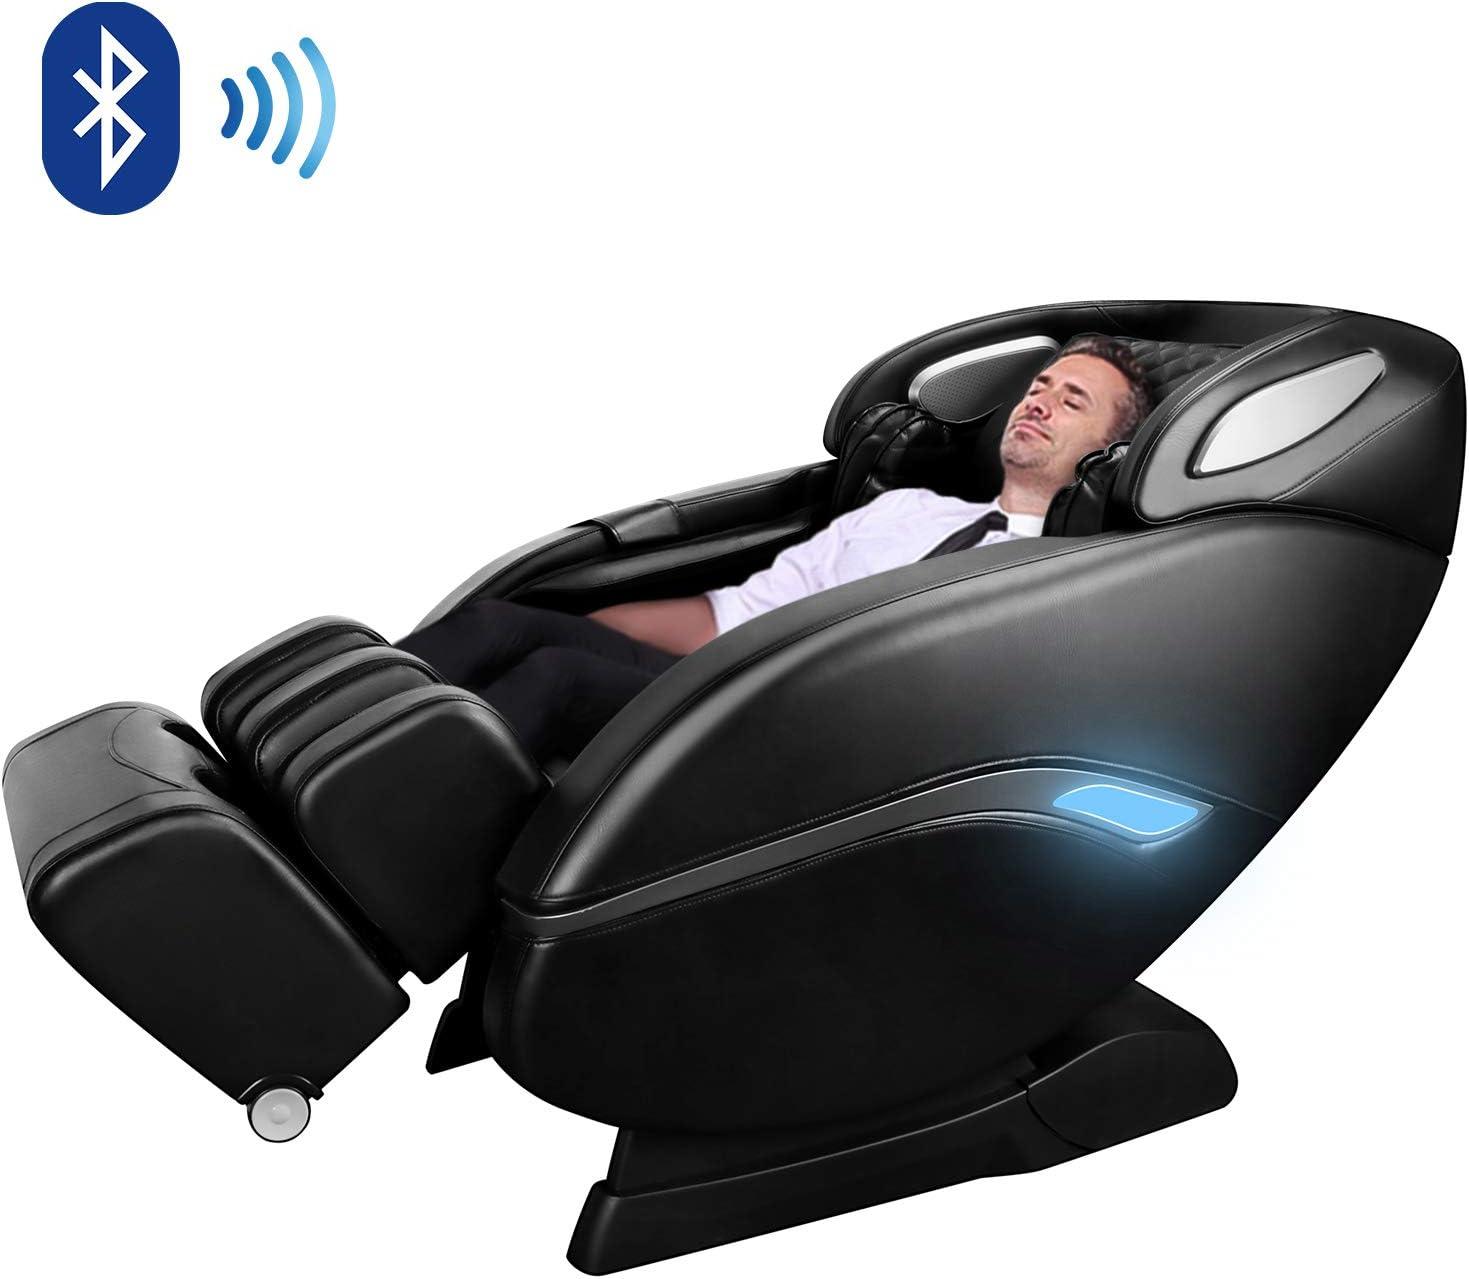 Massage Chair by OOTORI, Zero Gravity Massage Chair, Full Body Shiatsu Massage Chair Recliner with Space Saving, Yoga Stretching, SL Track, Bluetooth Speaker, Heat,Foot Roller Vibrator